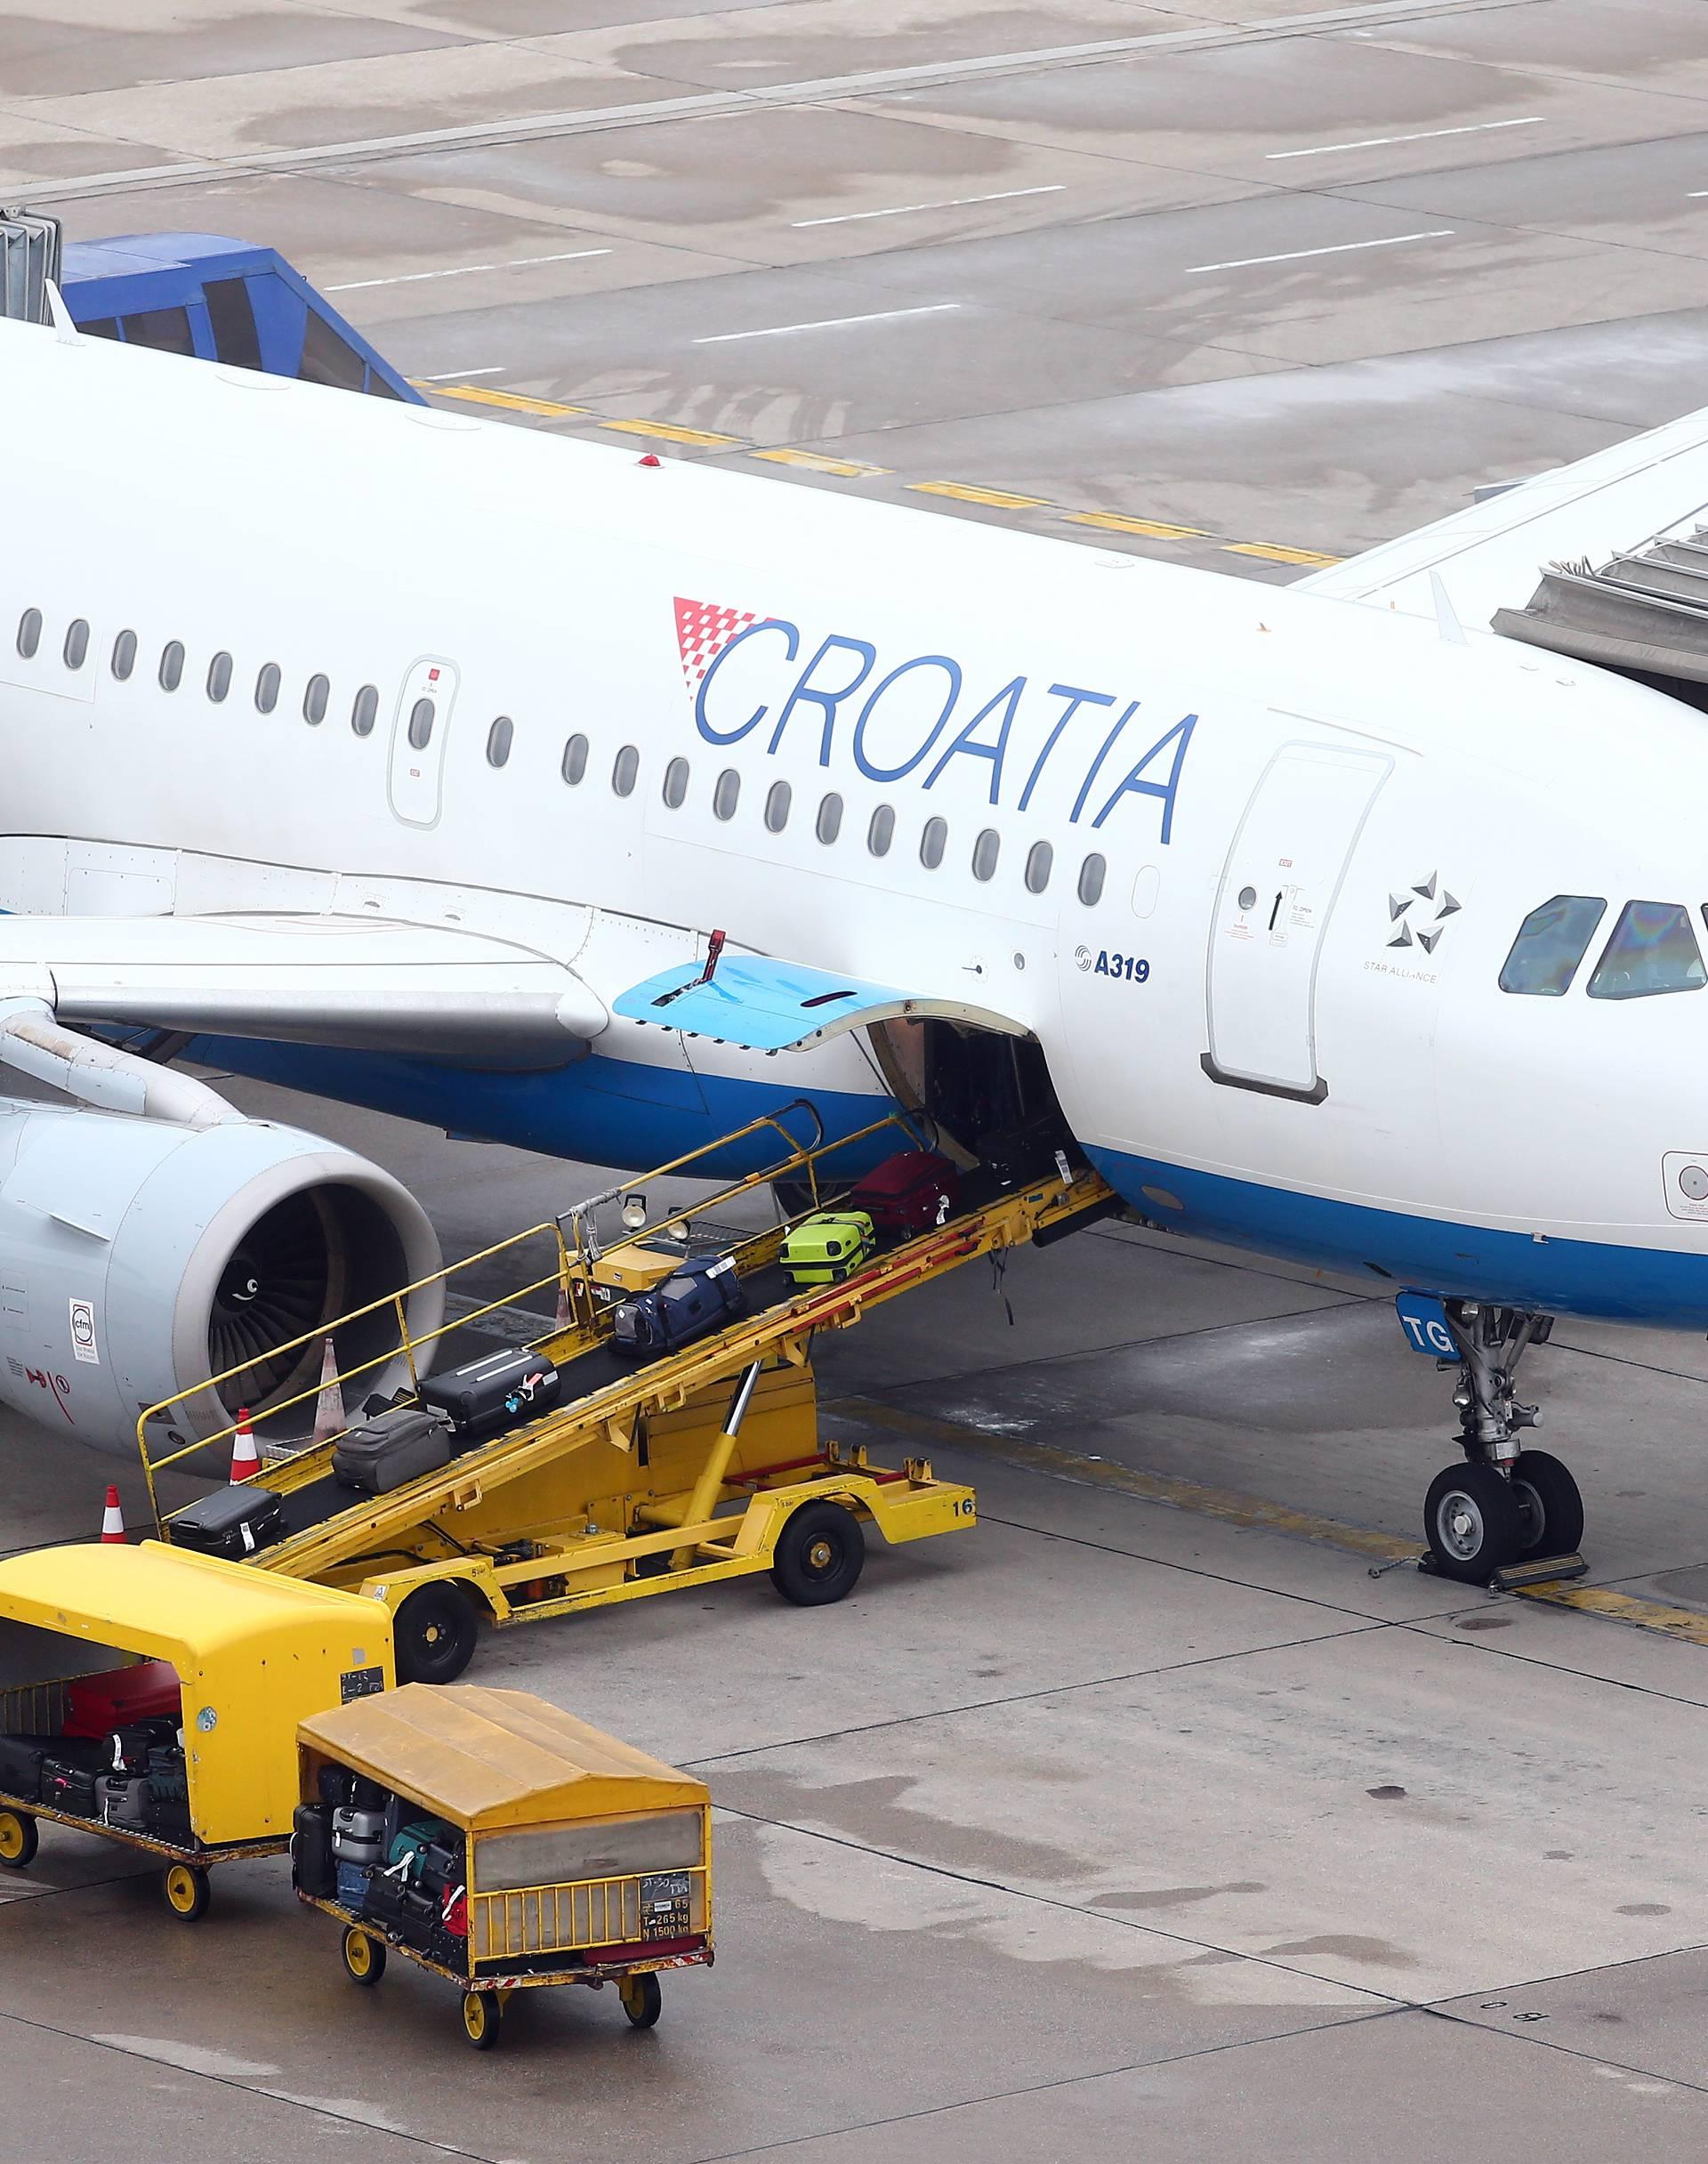 Oglasila se i Croatia Airlines: 'Držimo se visokih standarda'